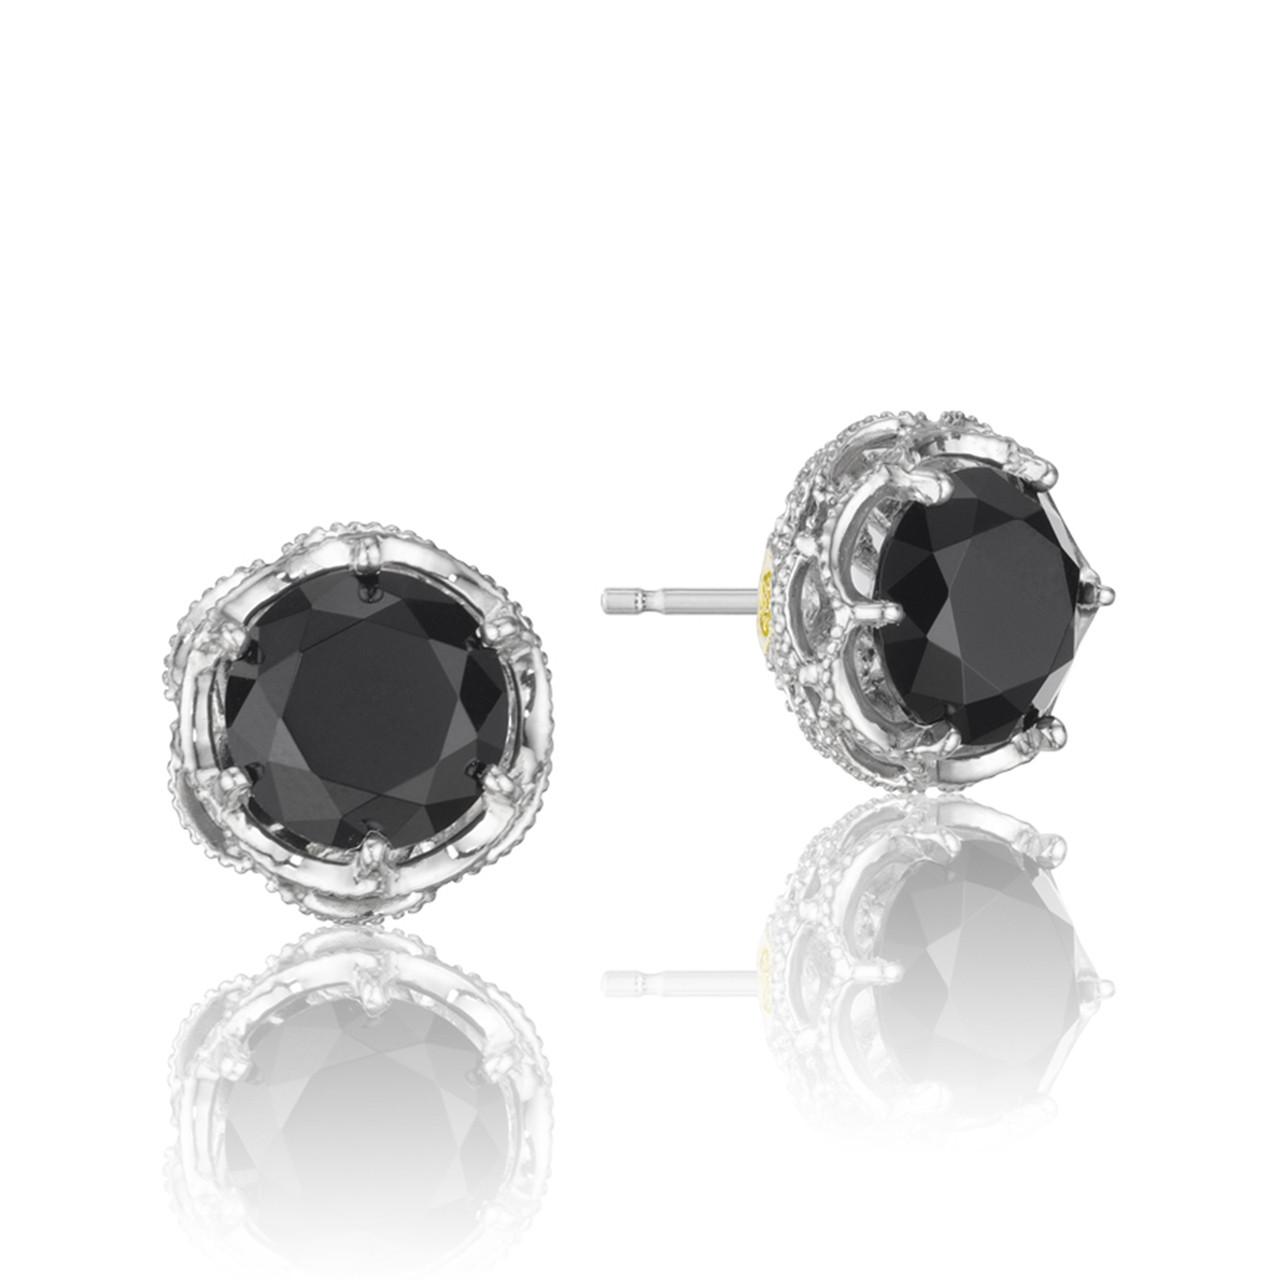 57c0fecba7da5 Crescent Crown Black Onyx Fashion Earrings (SE10519)